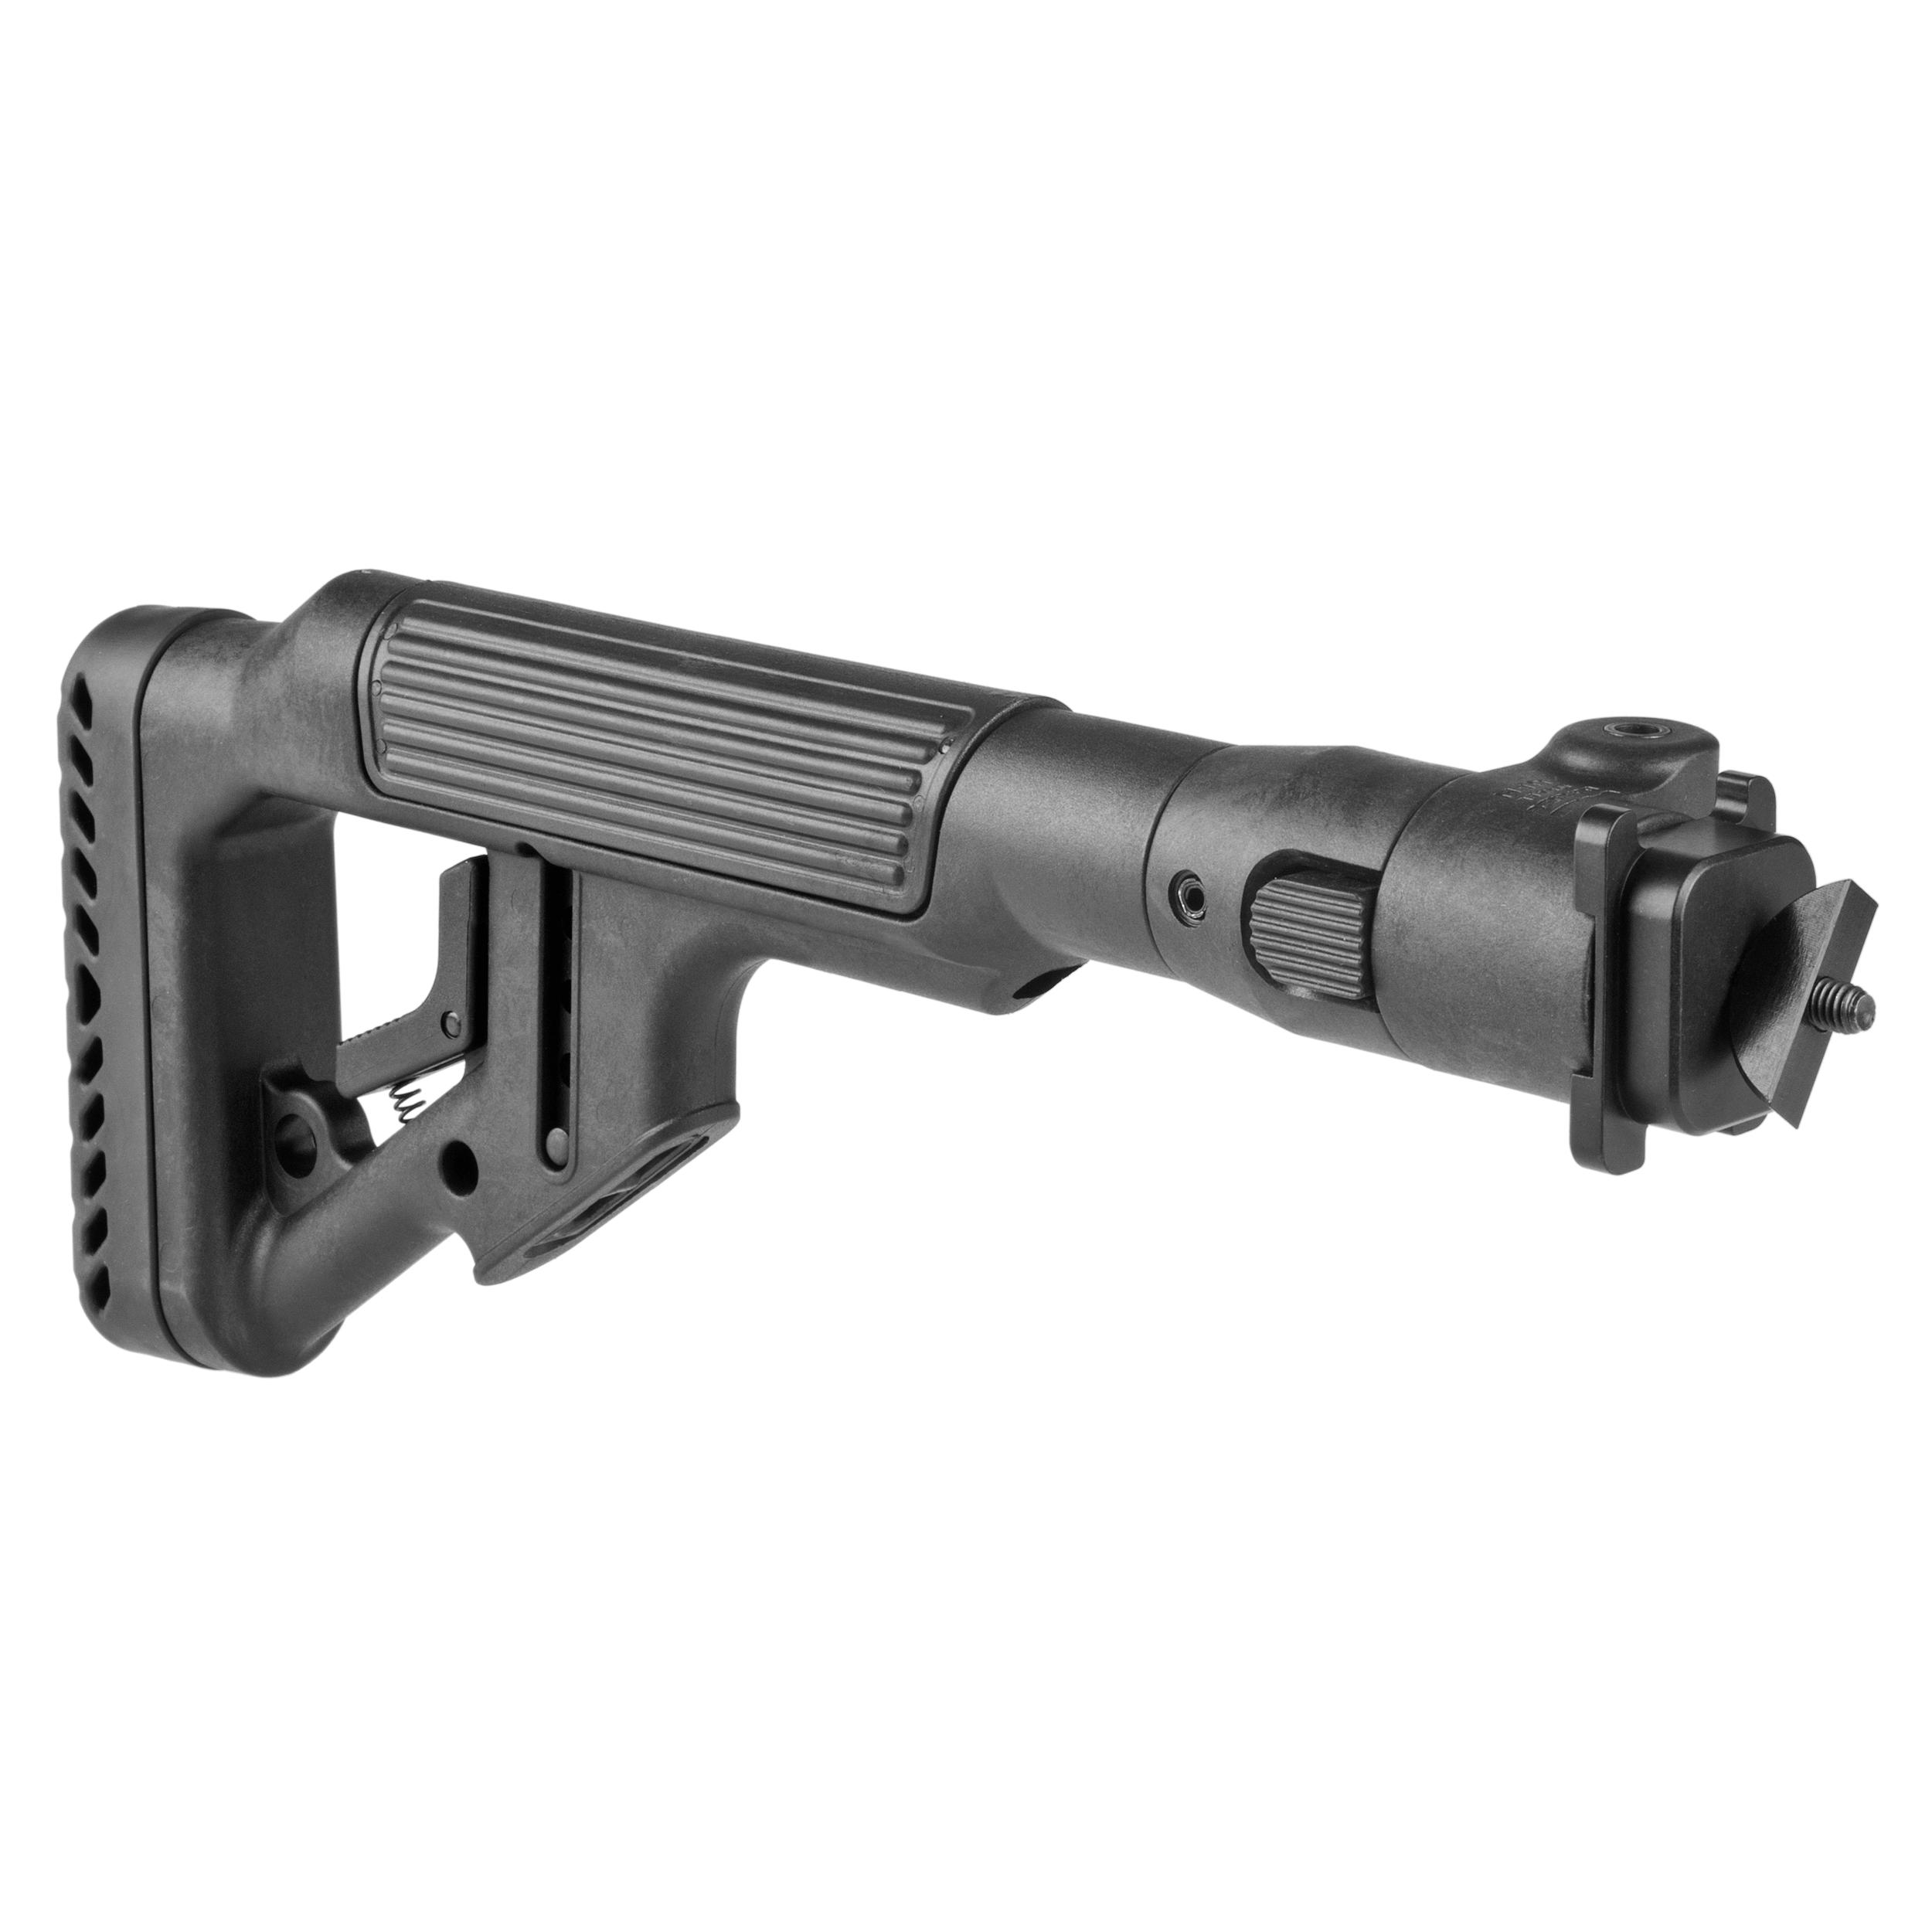 AK47 Folding Buttstock / Cheek Rest / Milled Receivers (Polymer Joint)